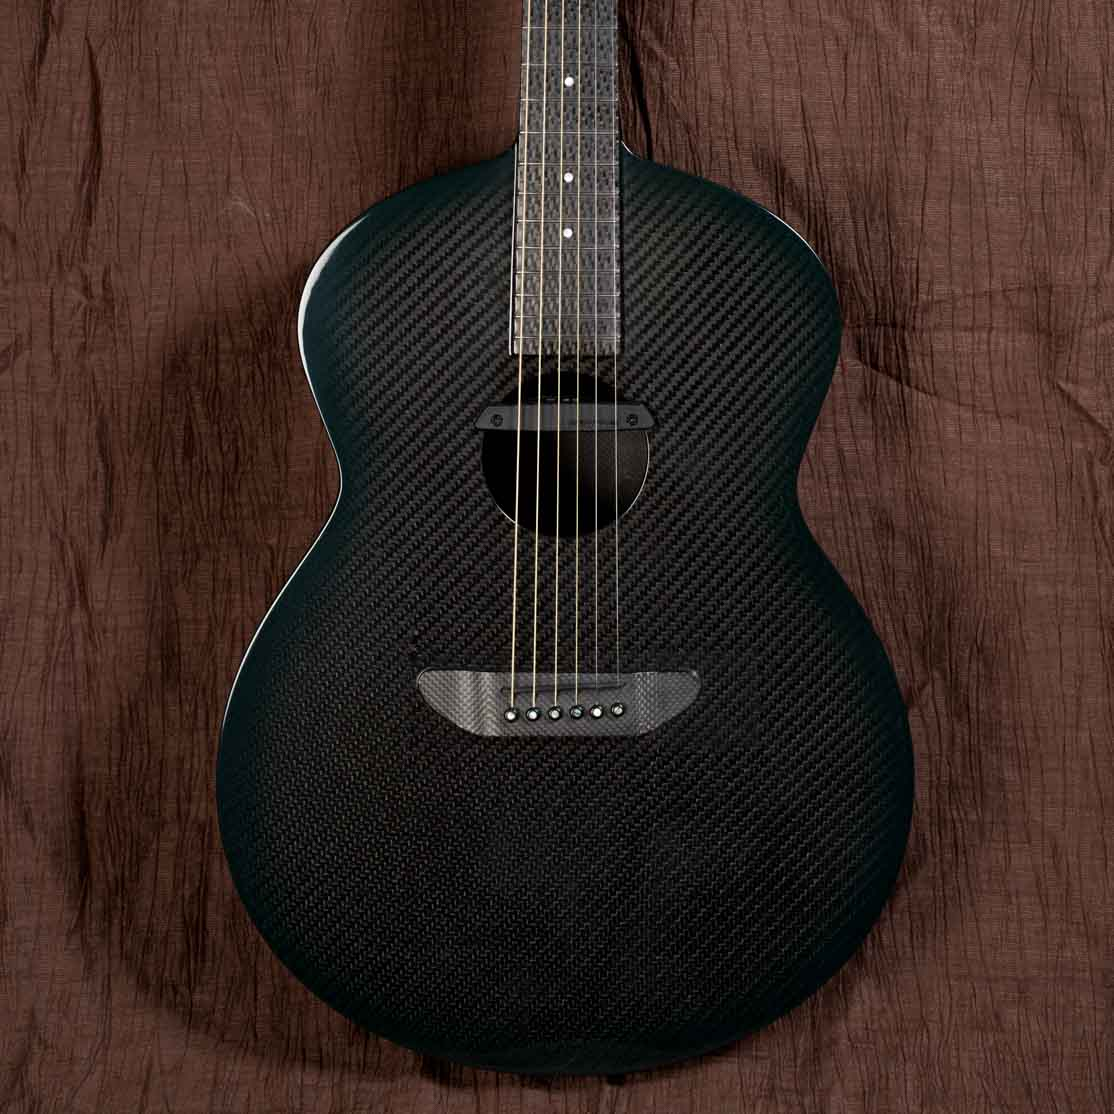 sumimaru_guitar_full1